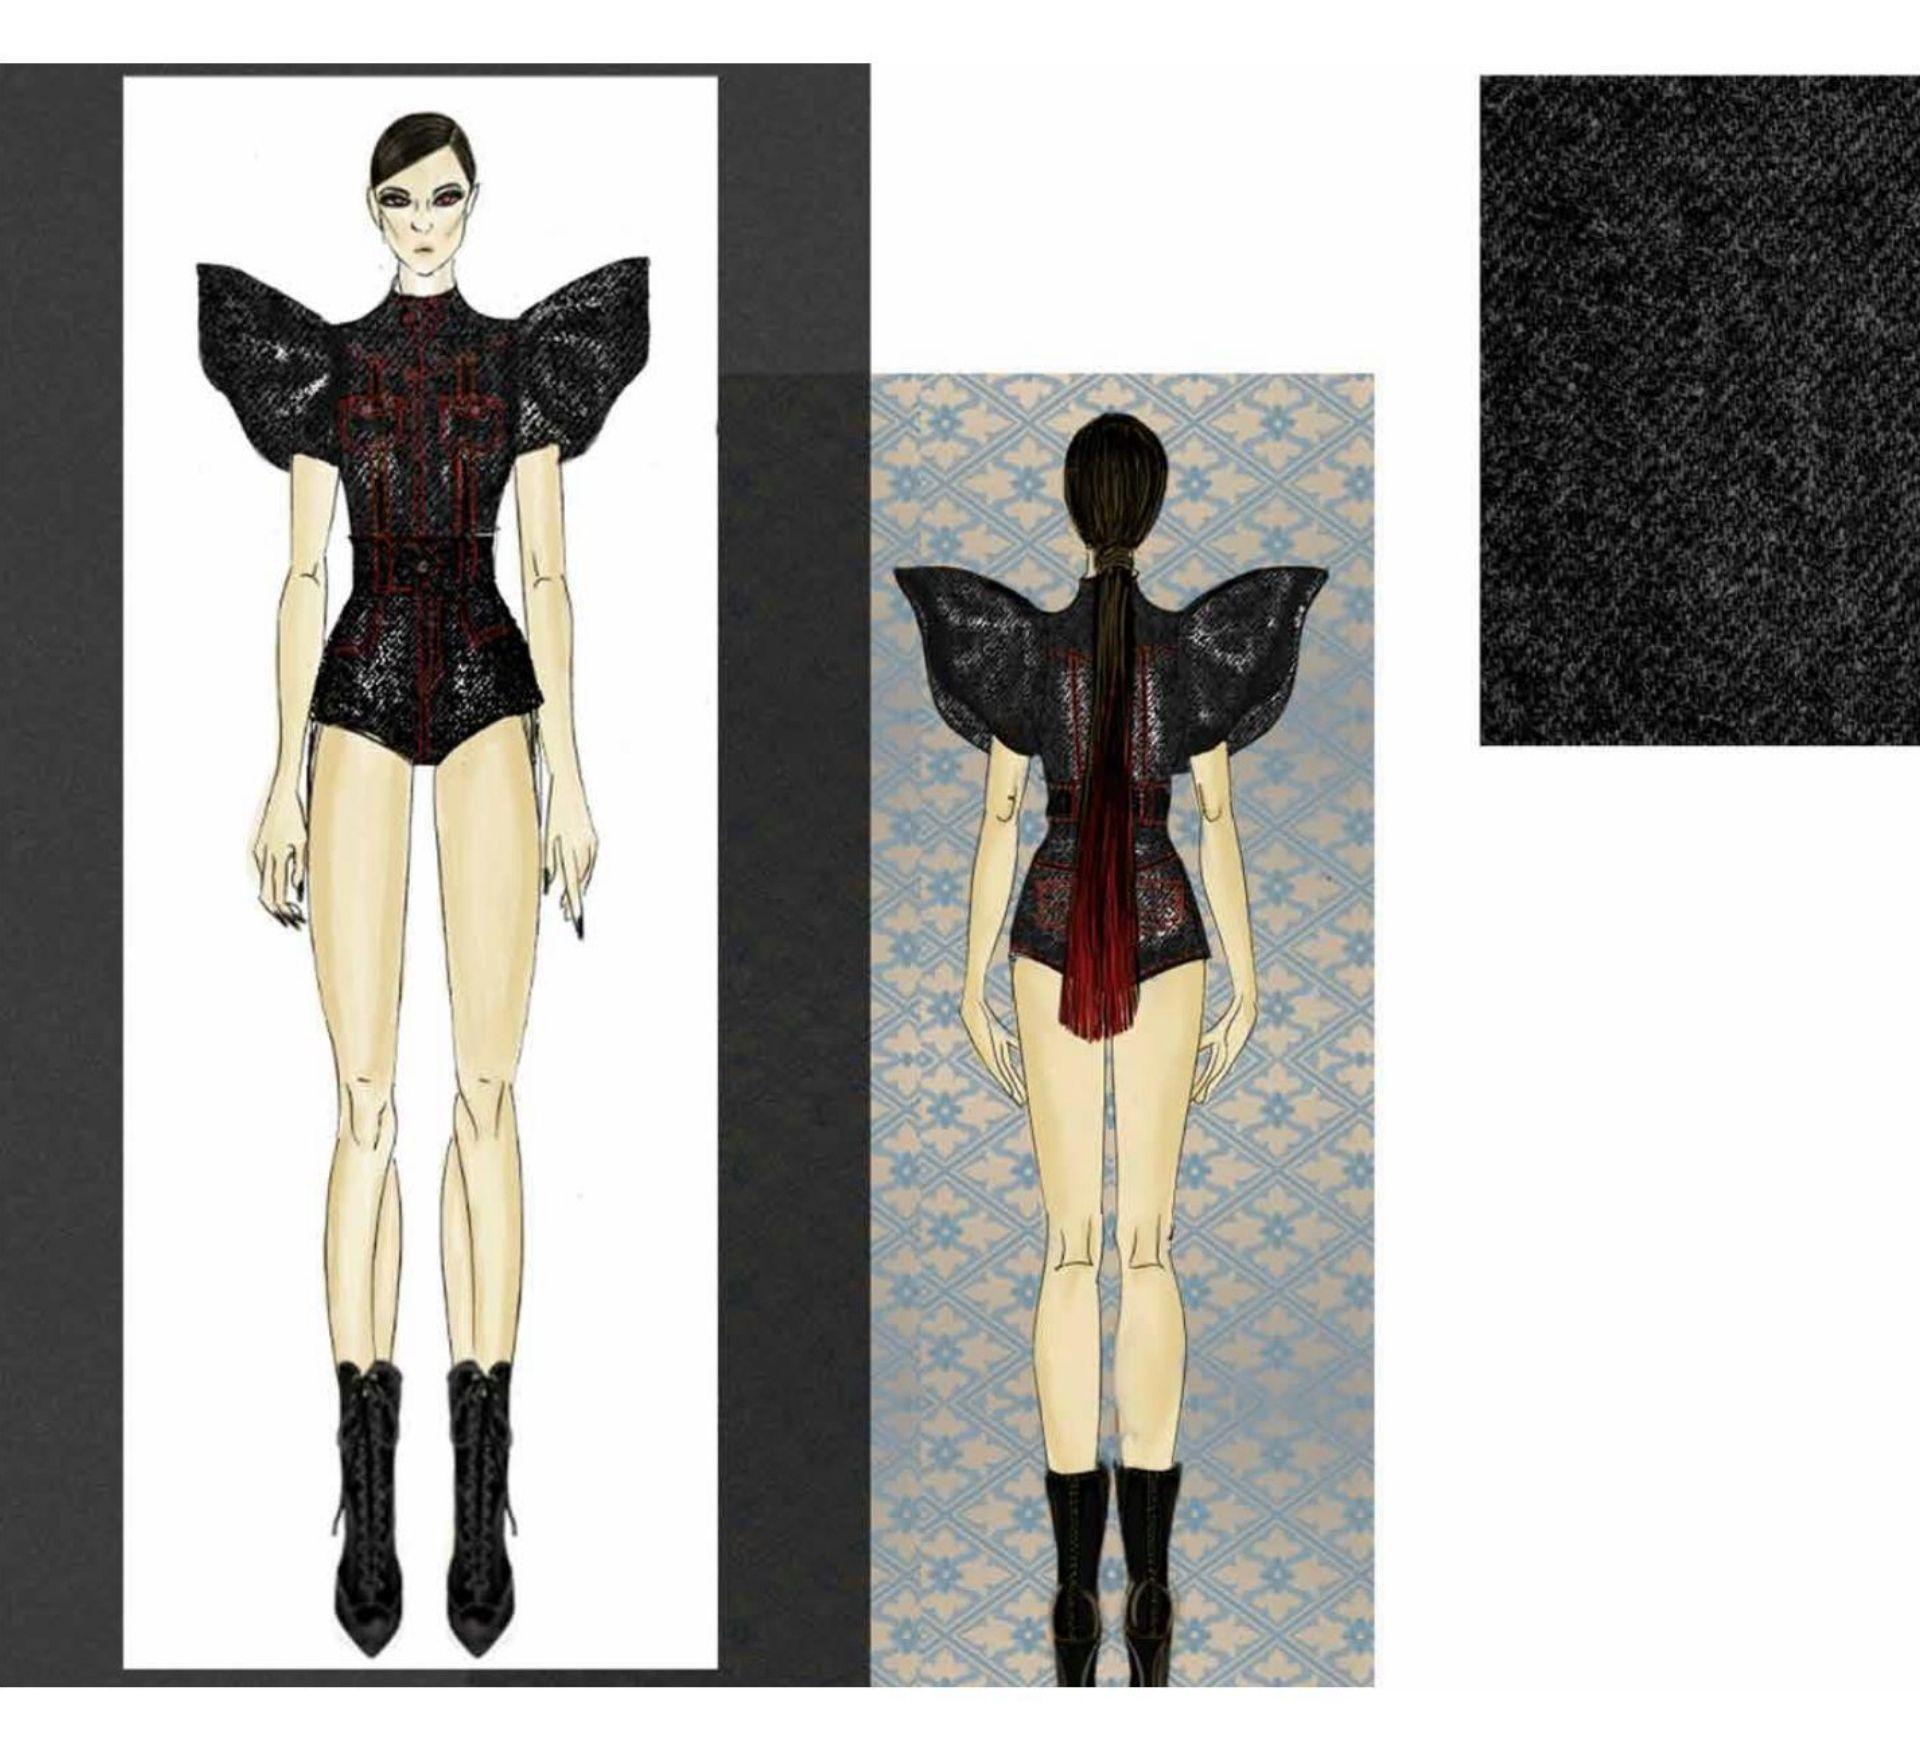 Vespa Denim Project - 2